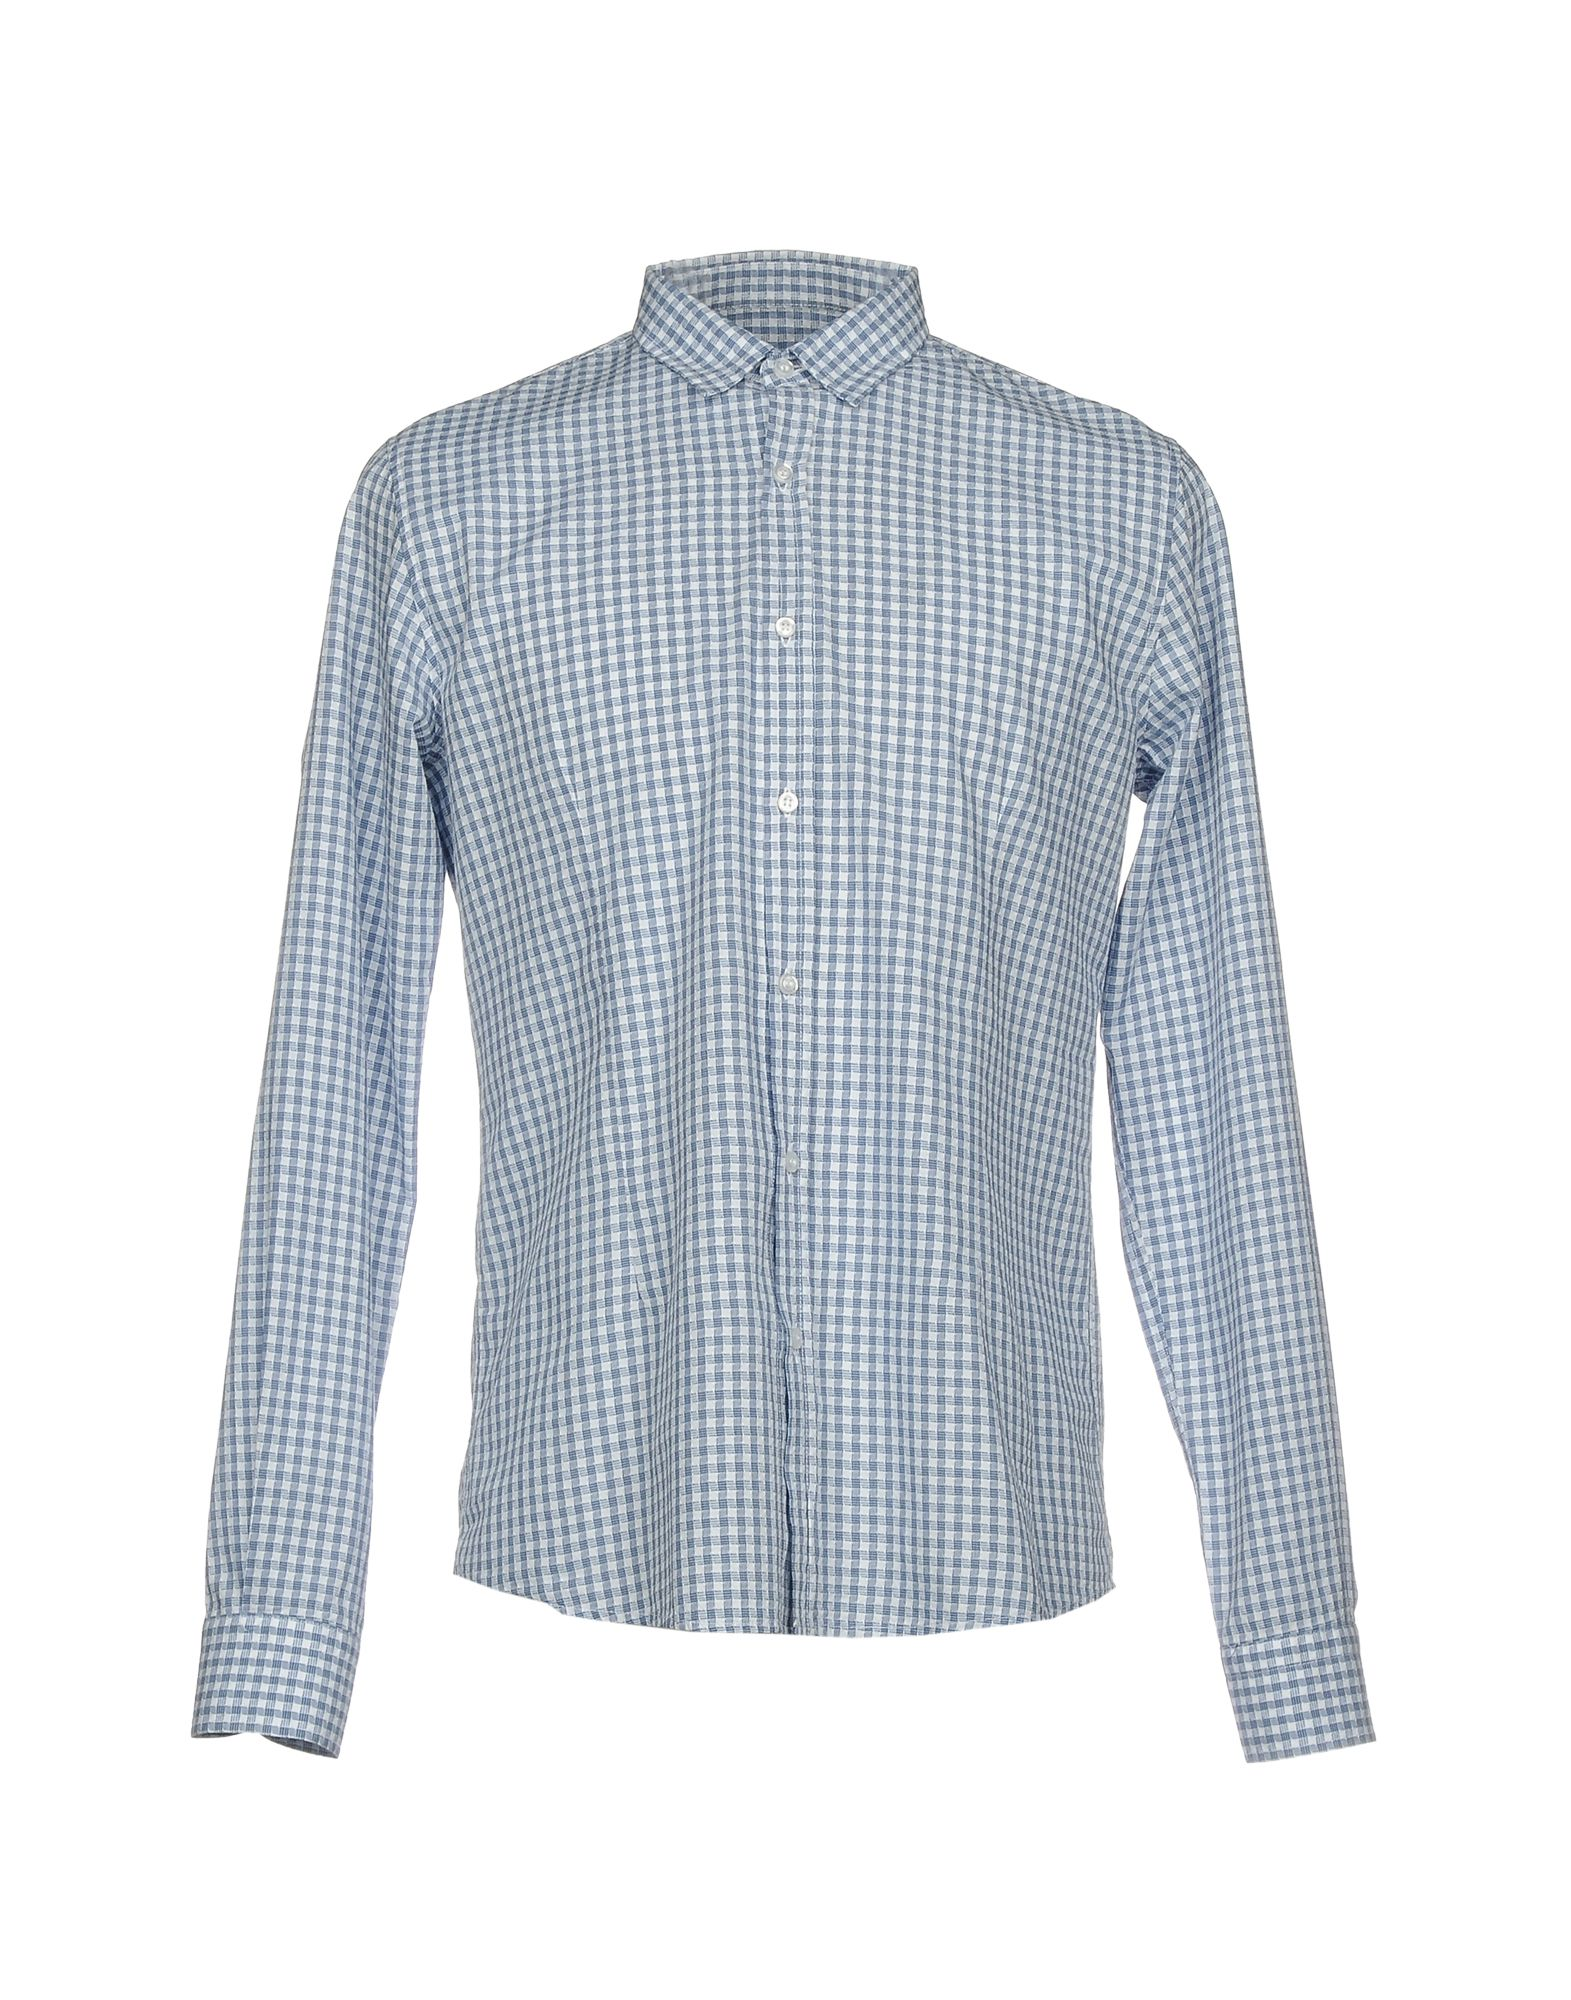 VIA DEI TINTORI Pубашка via dei tintori pубашка